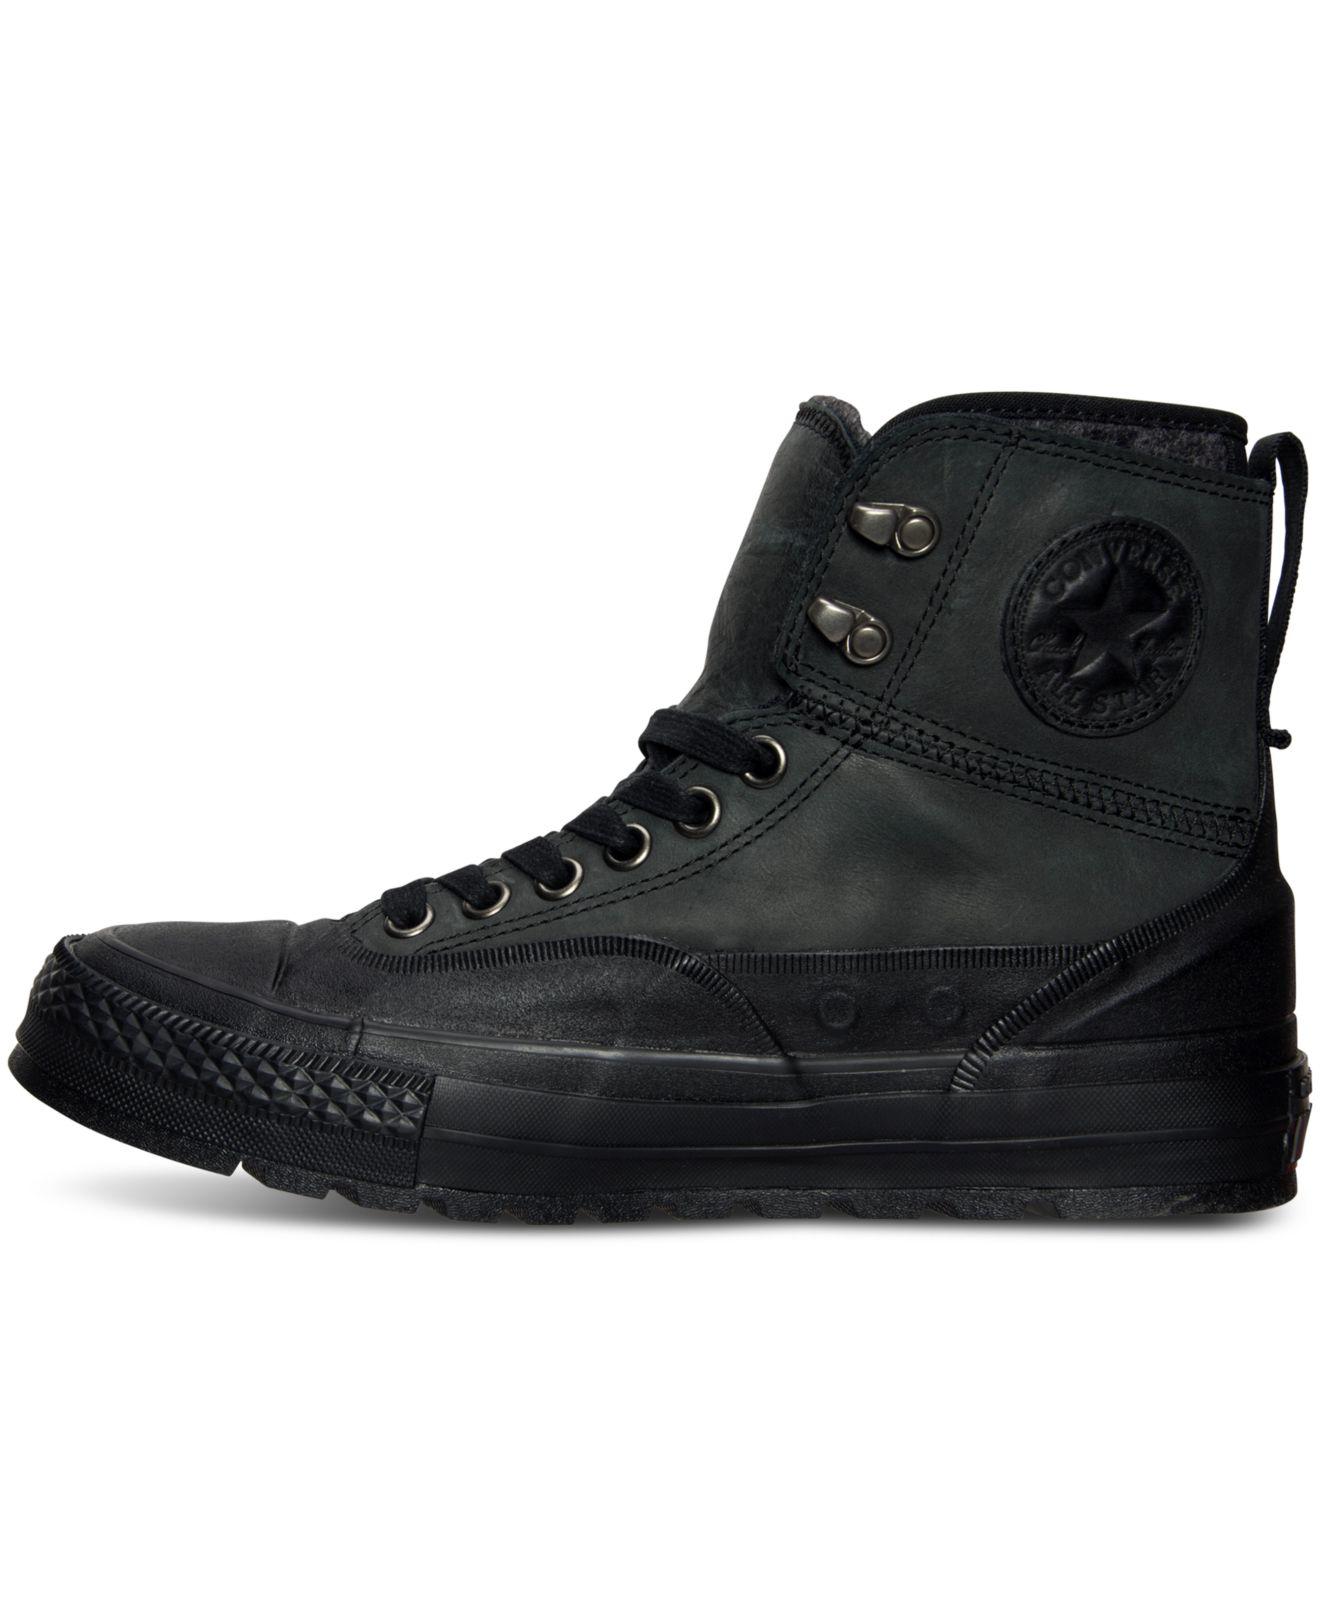 Lyst - Converse Men s Chuck Taylor All Star Tekoa Boots From Finish ... a3f6fddb7